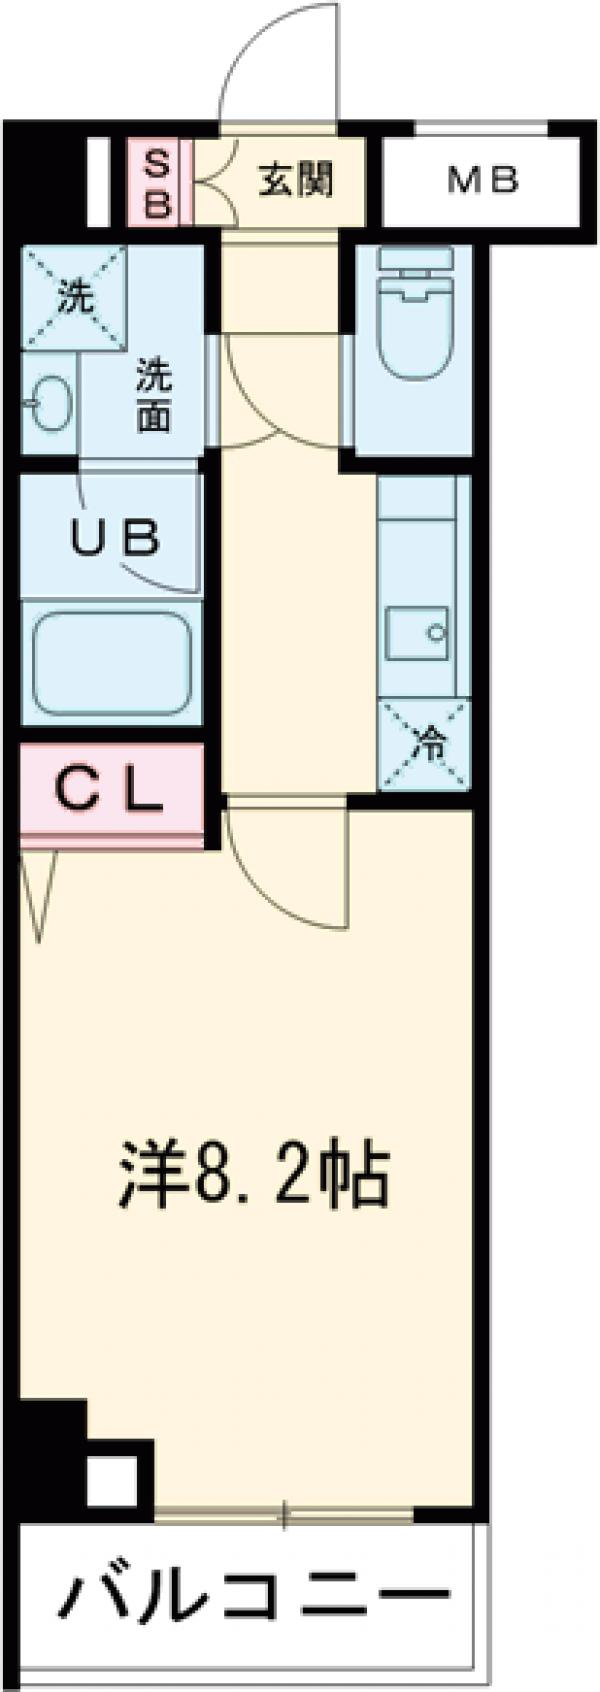 GENOVIA西高島平skygarden・504号室の間取り